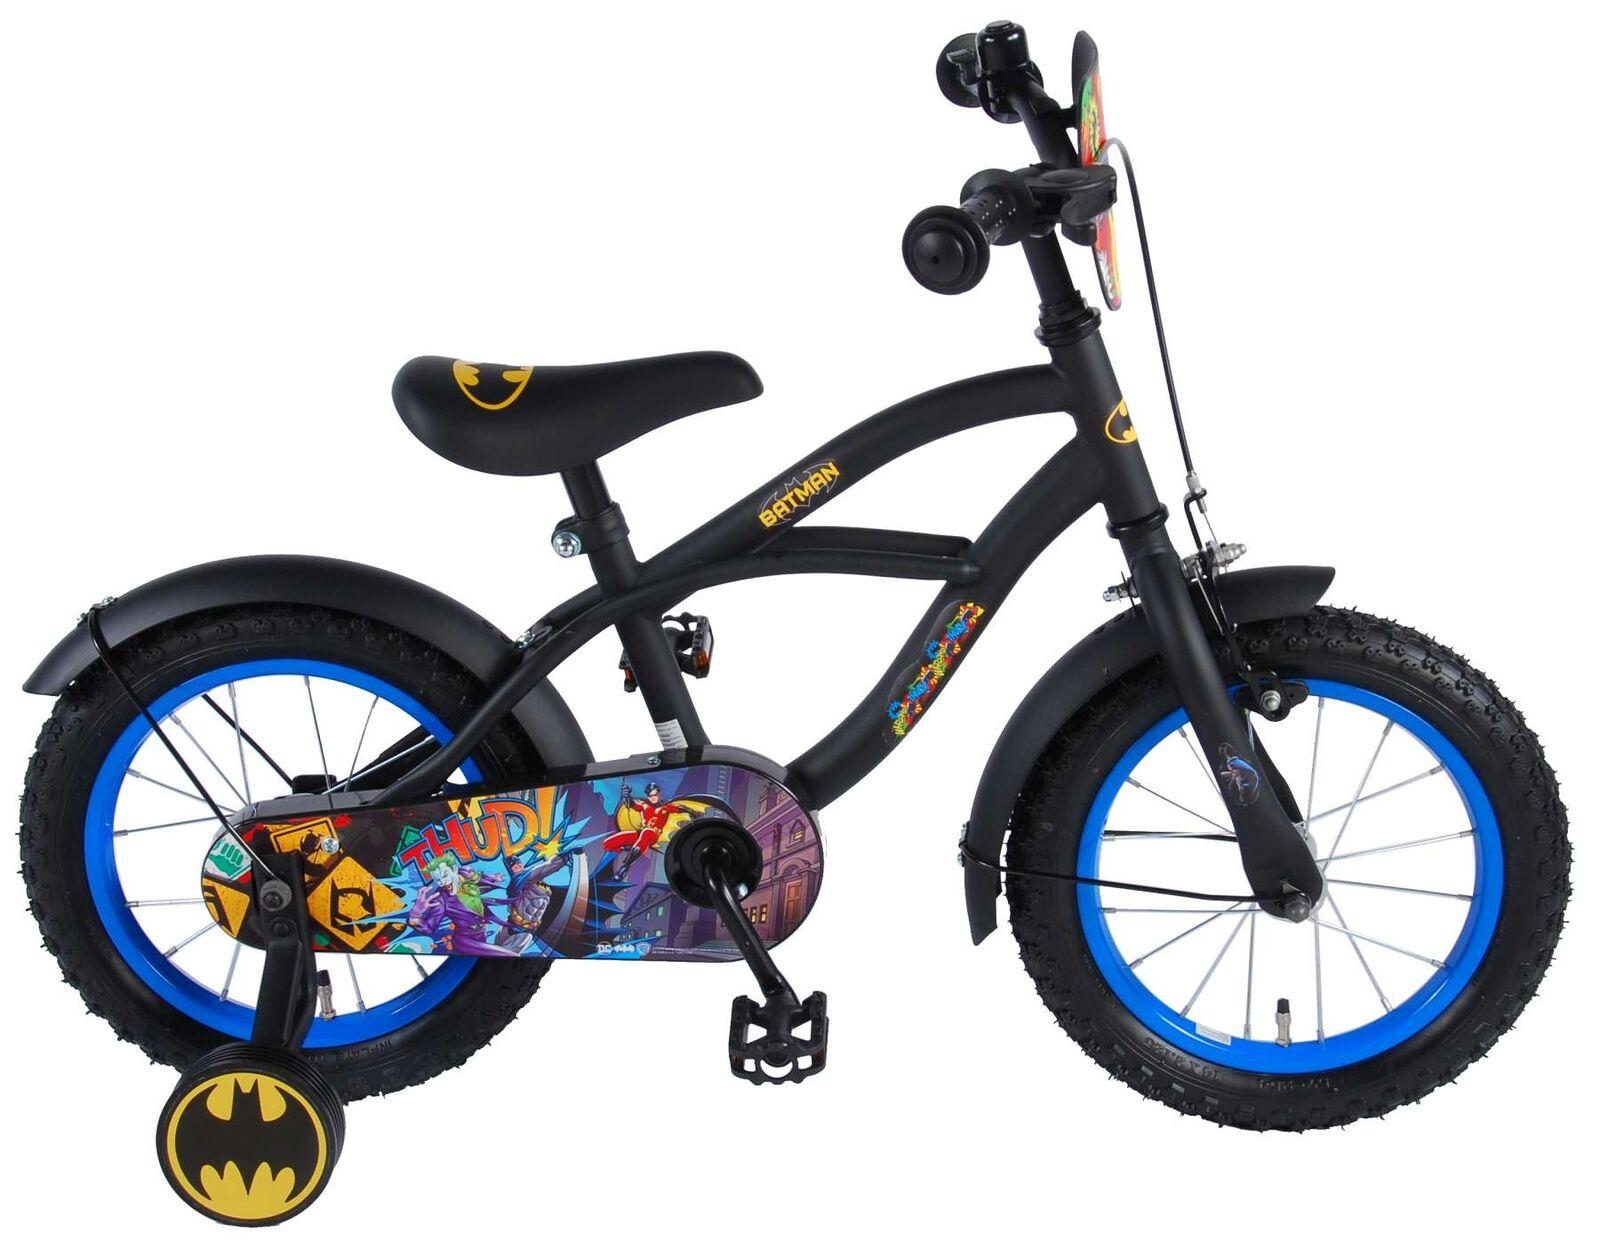 Batman Fahrrad 14 Zoll schwarz matt Kinderfahrrad mit Stützrädern Jungen ab 3